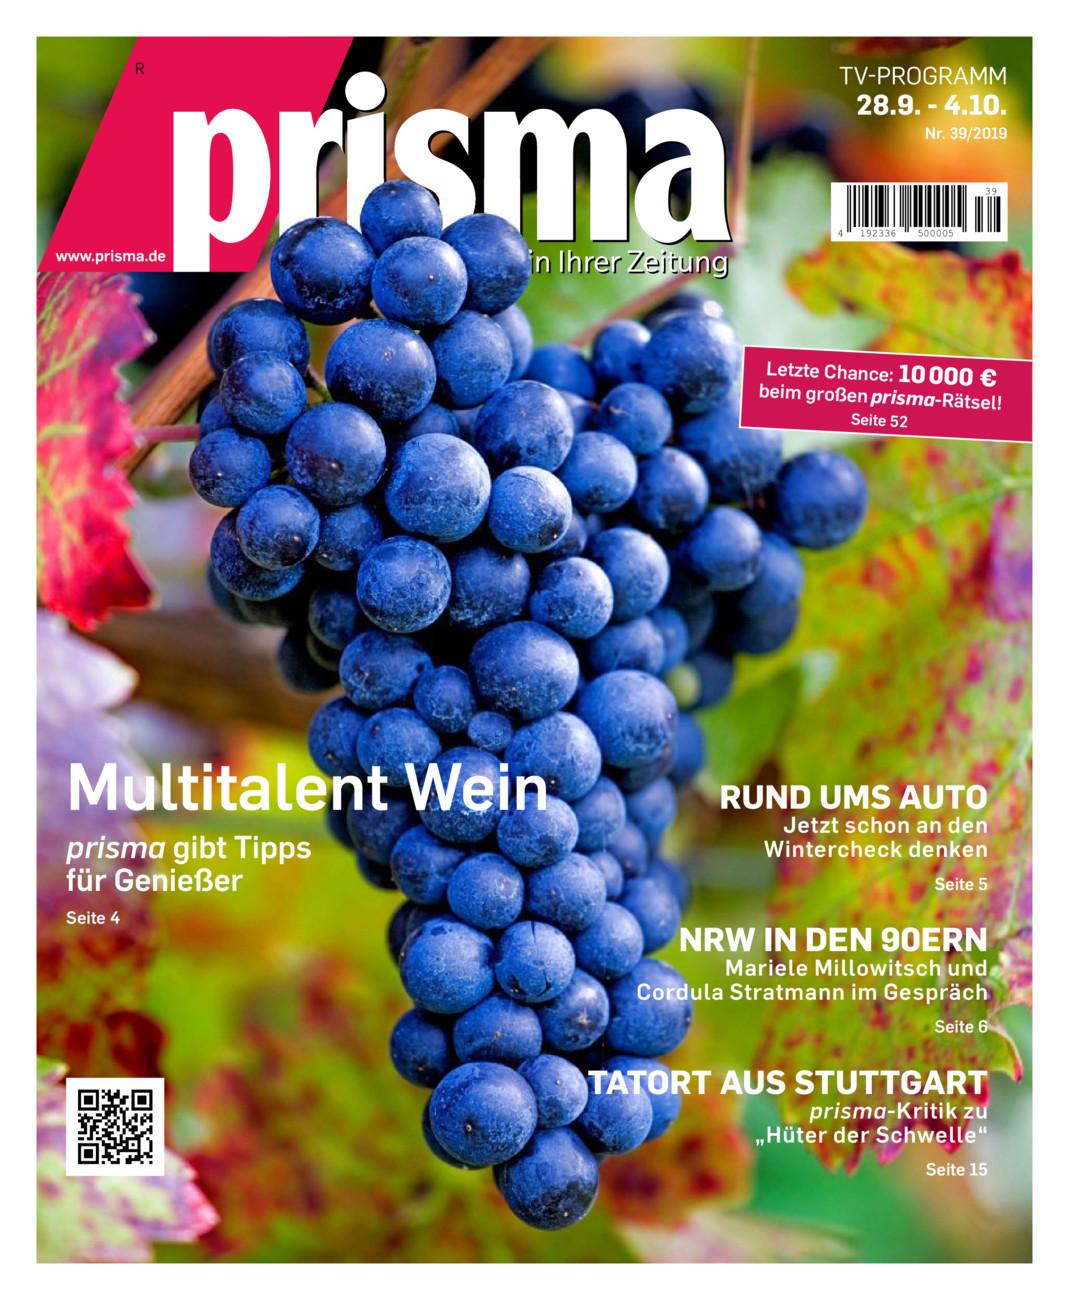 Prisma 28.09. - 04.10.